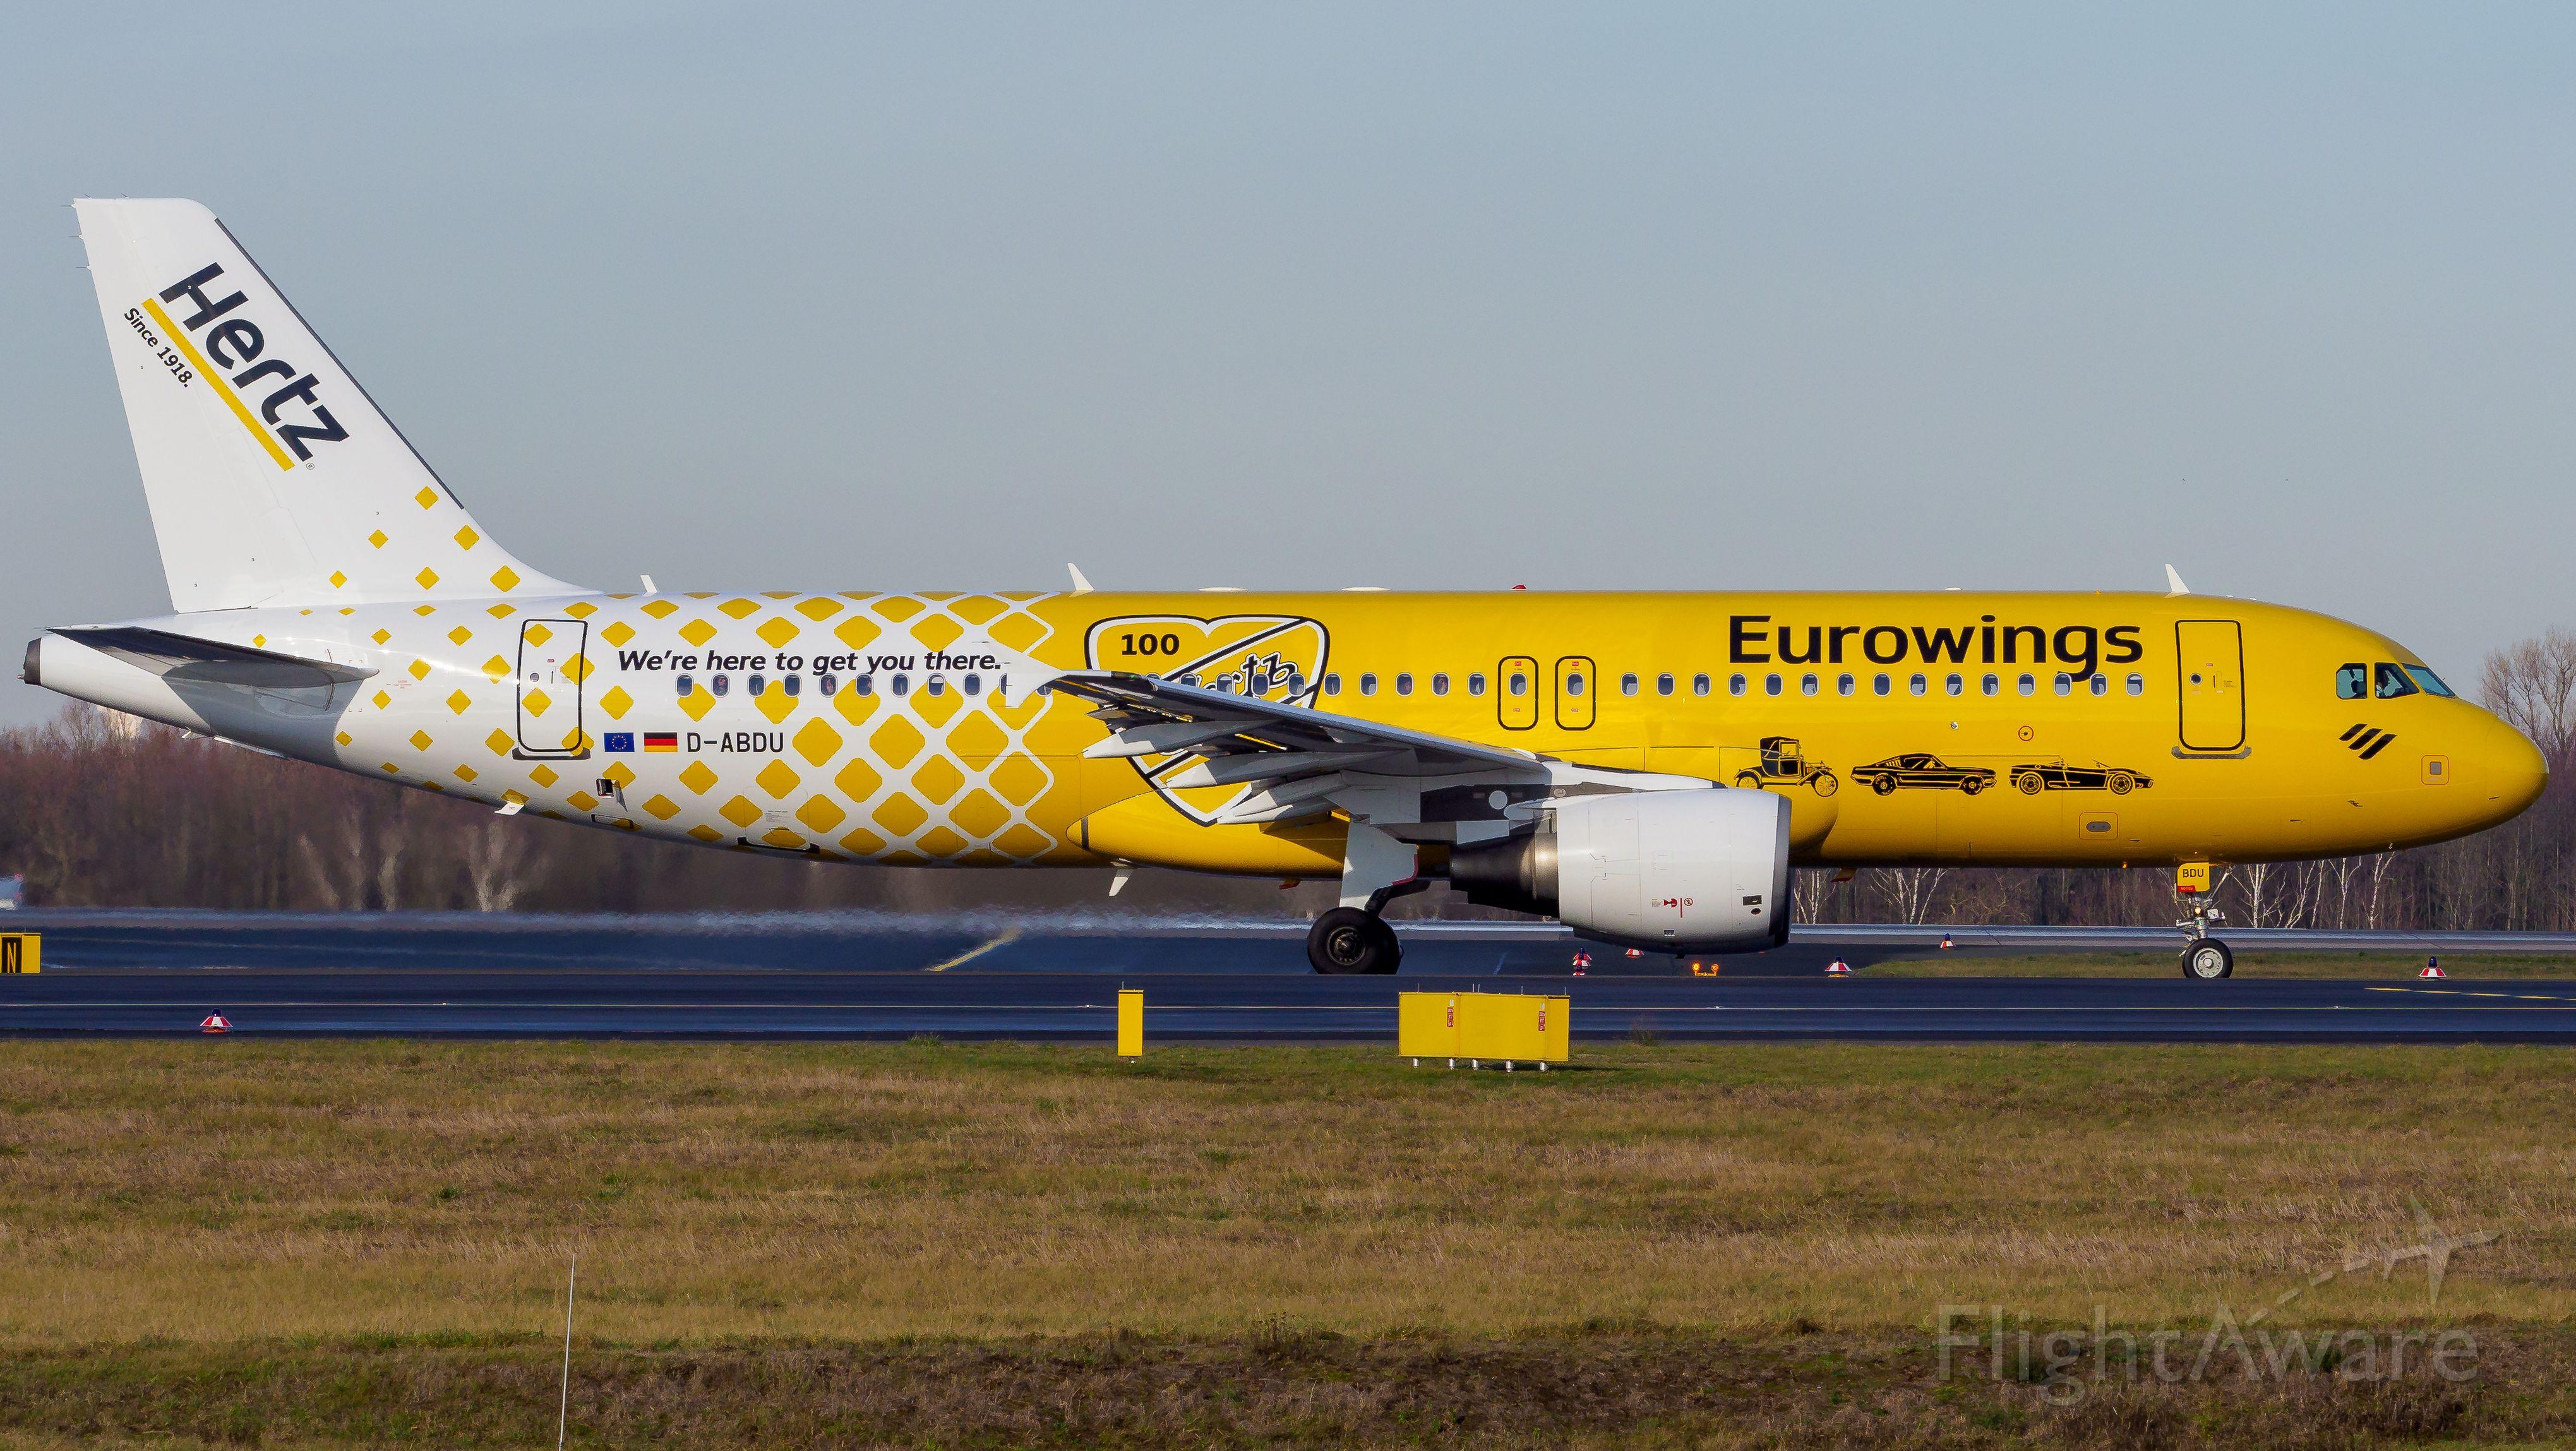 Airbus A320 (D-ABDU) - Hertz livery